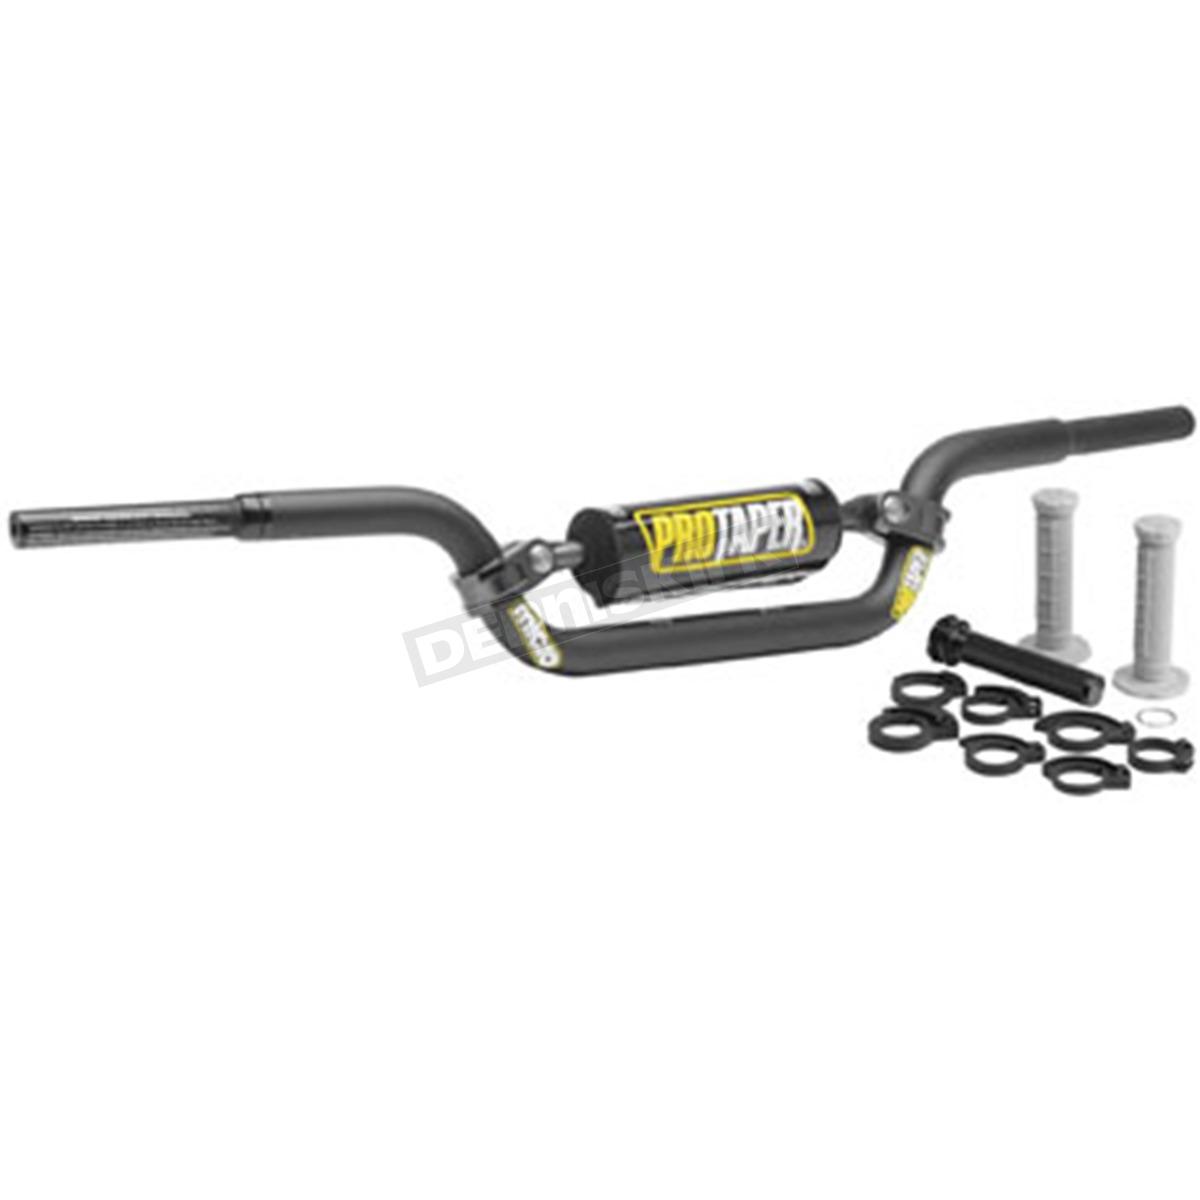 Pro Taper Micro Ktm 50 Handlebar Kit